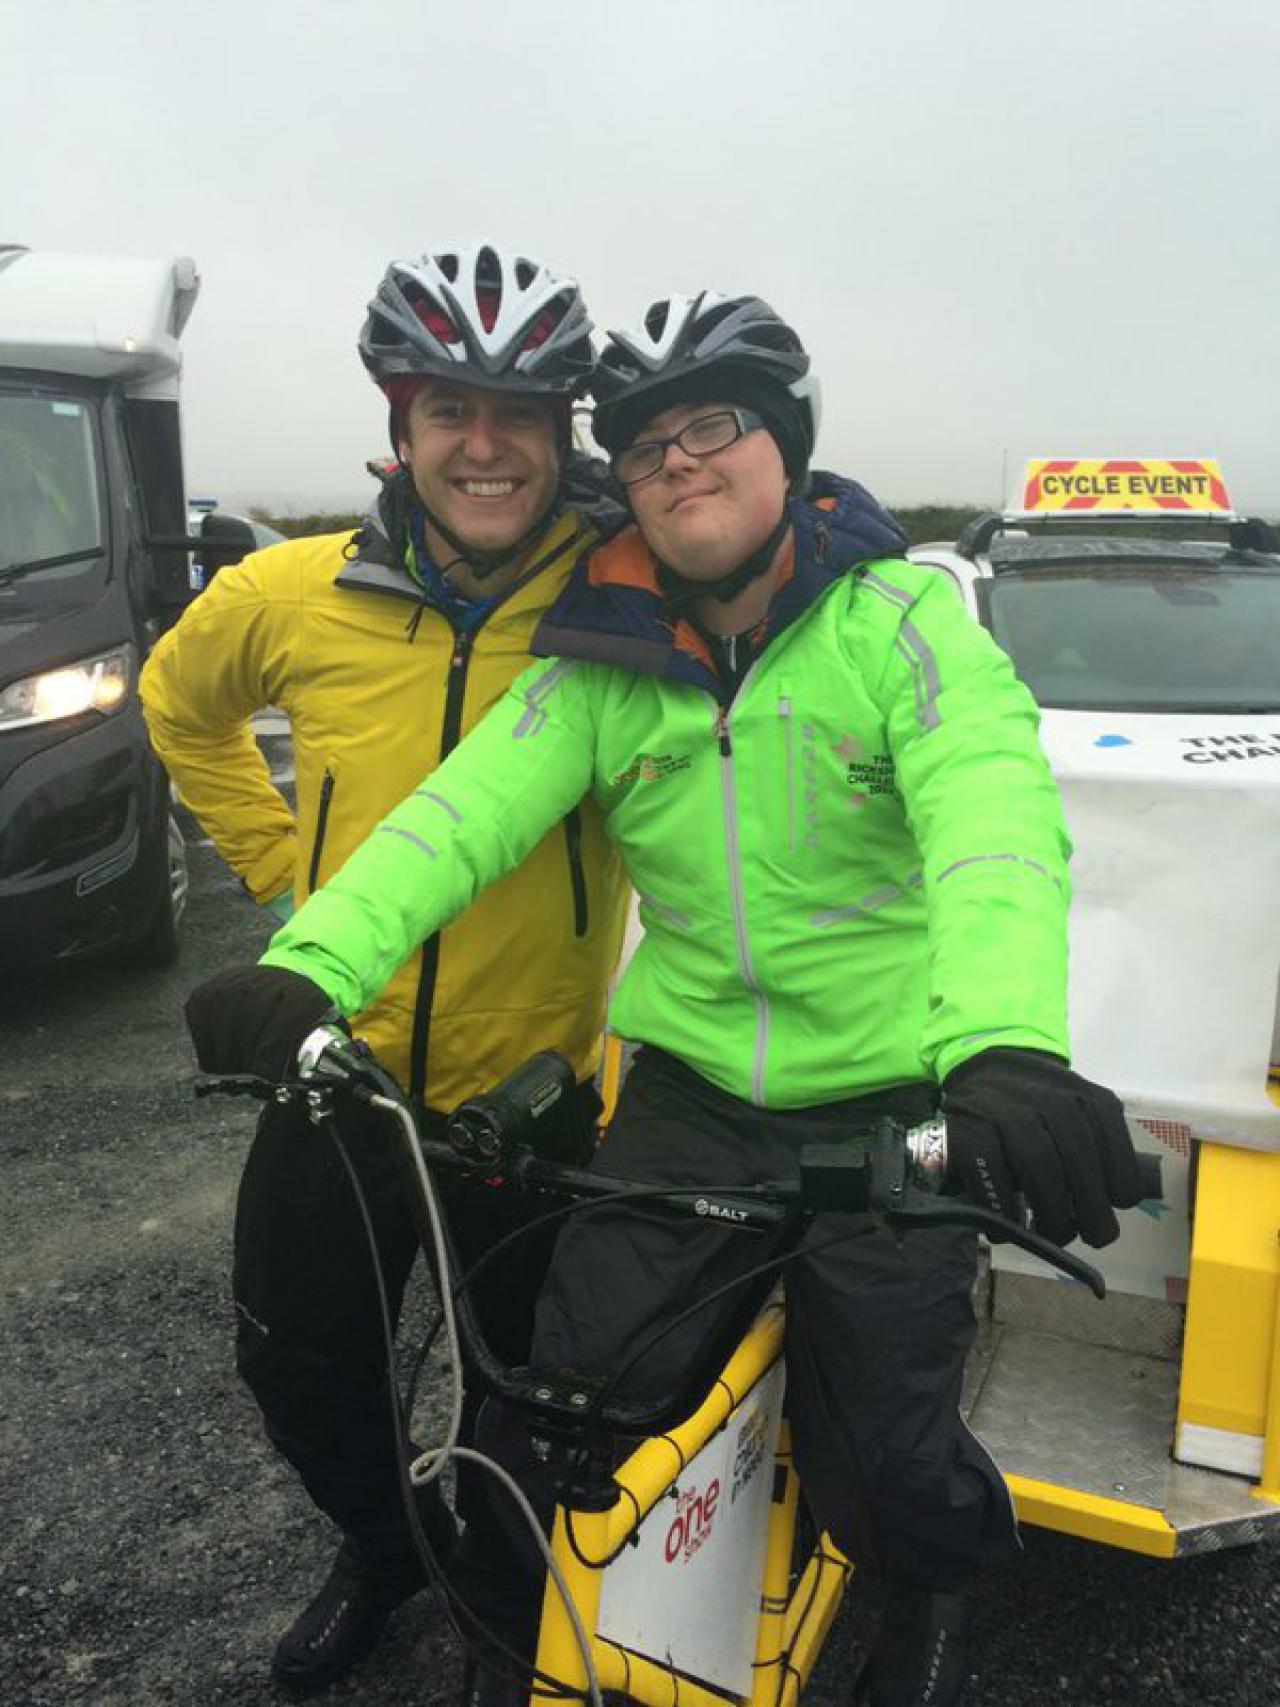 951a3e6d30e One Show presenter Matt Baker and six intrepid teenagers set off on a 470  mile rickshaw journey